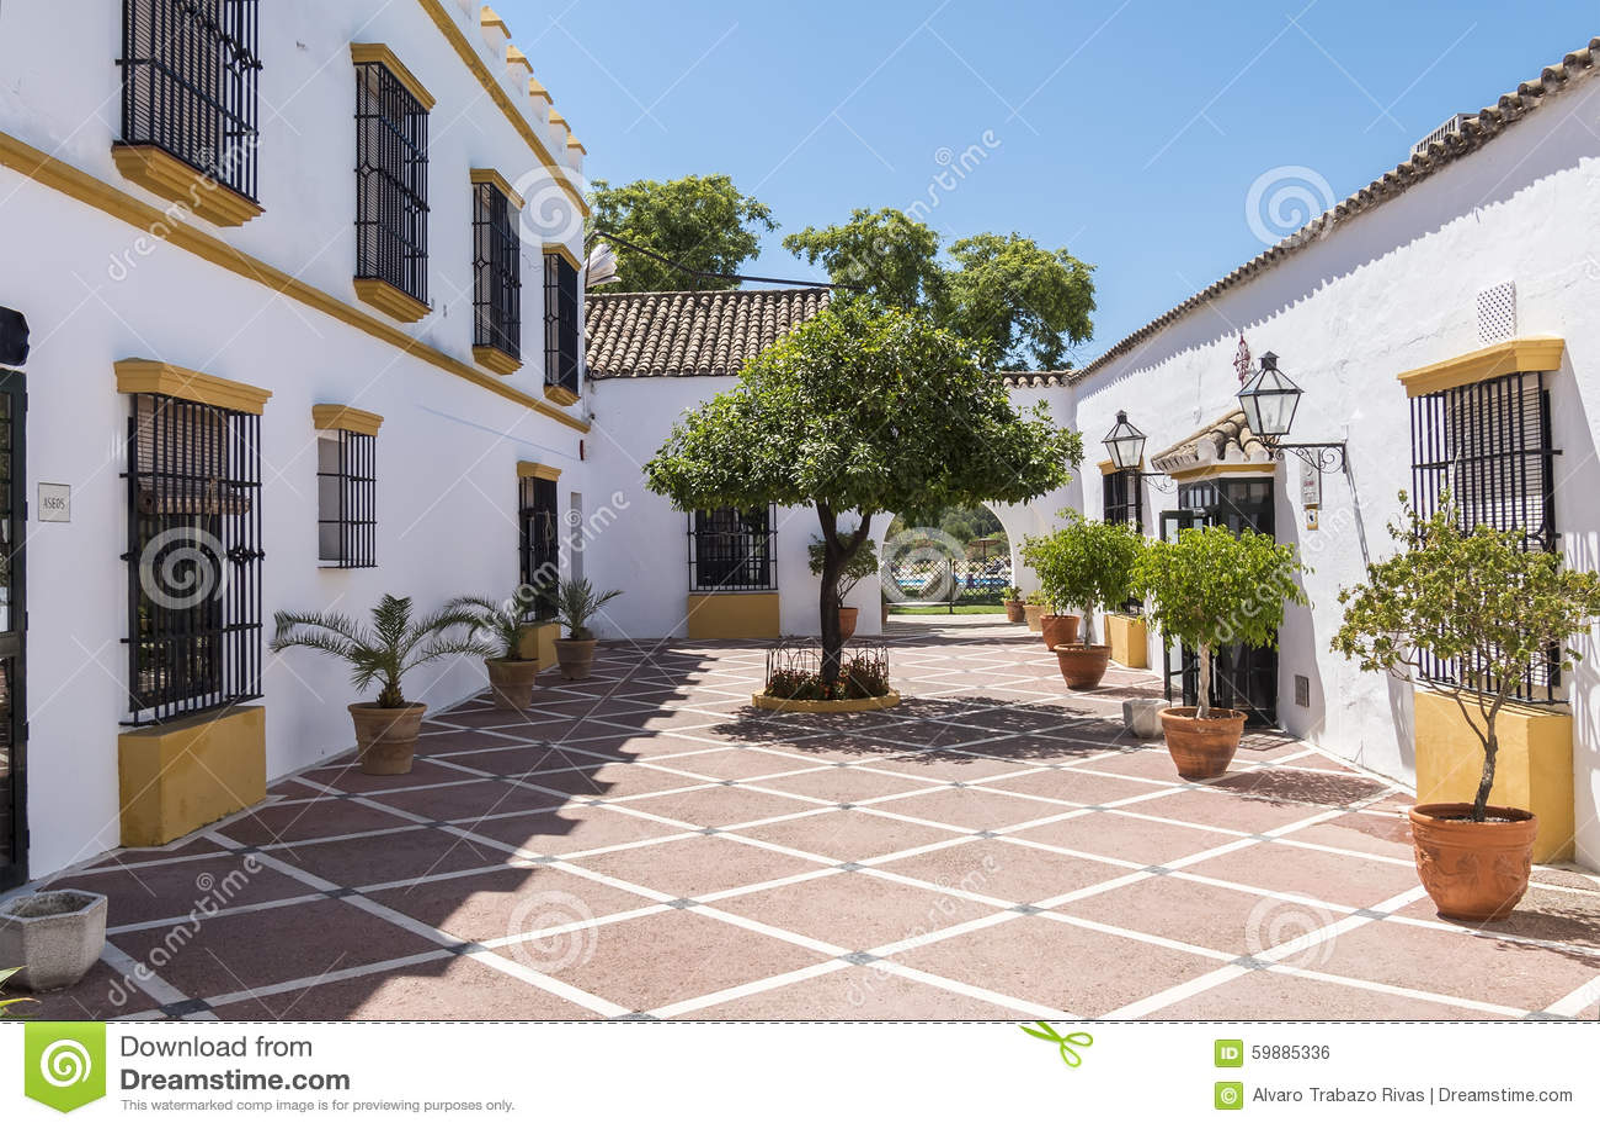 Azulejos patio andaluz finest azulejos patio andaluz with - Un patio andaluz ...